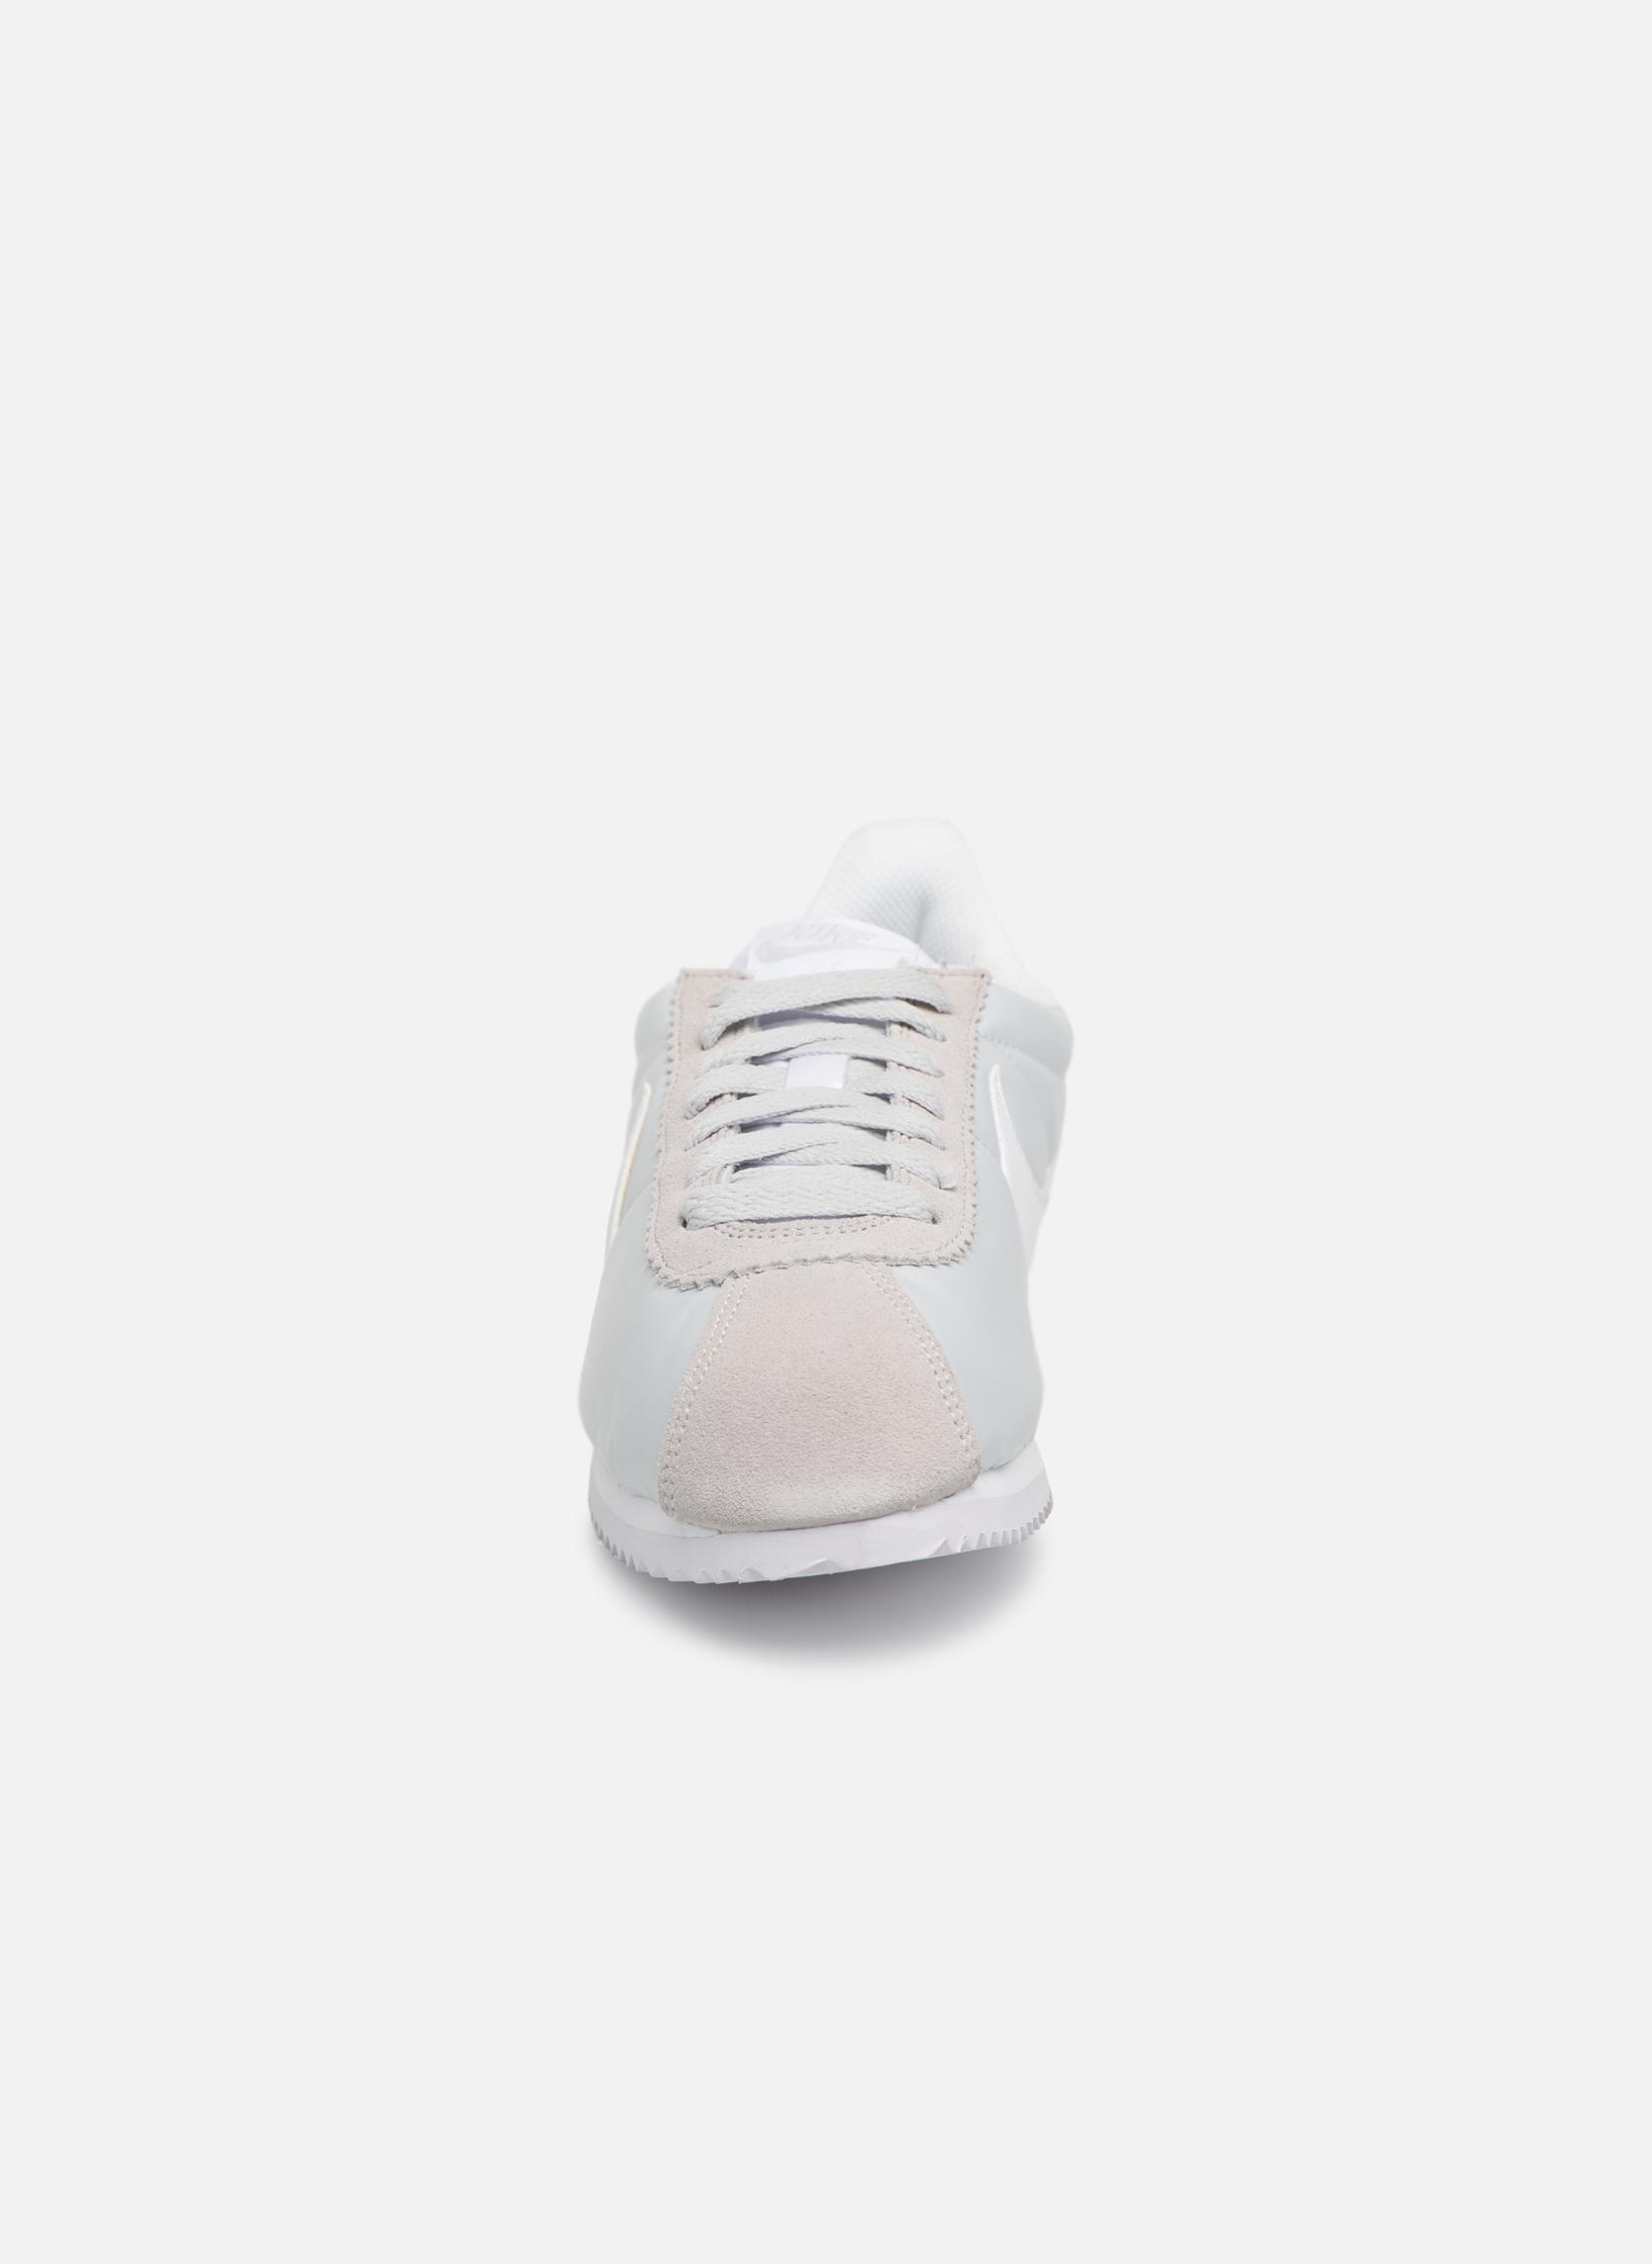 Deportivas Nike Wmns Classic Cortez Nylon Gris vista del modelo